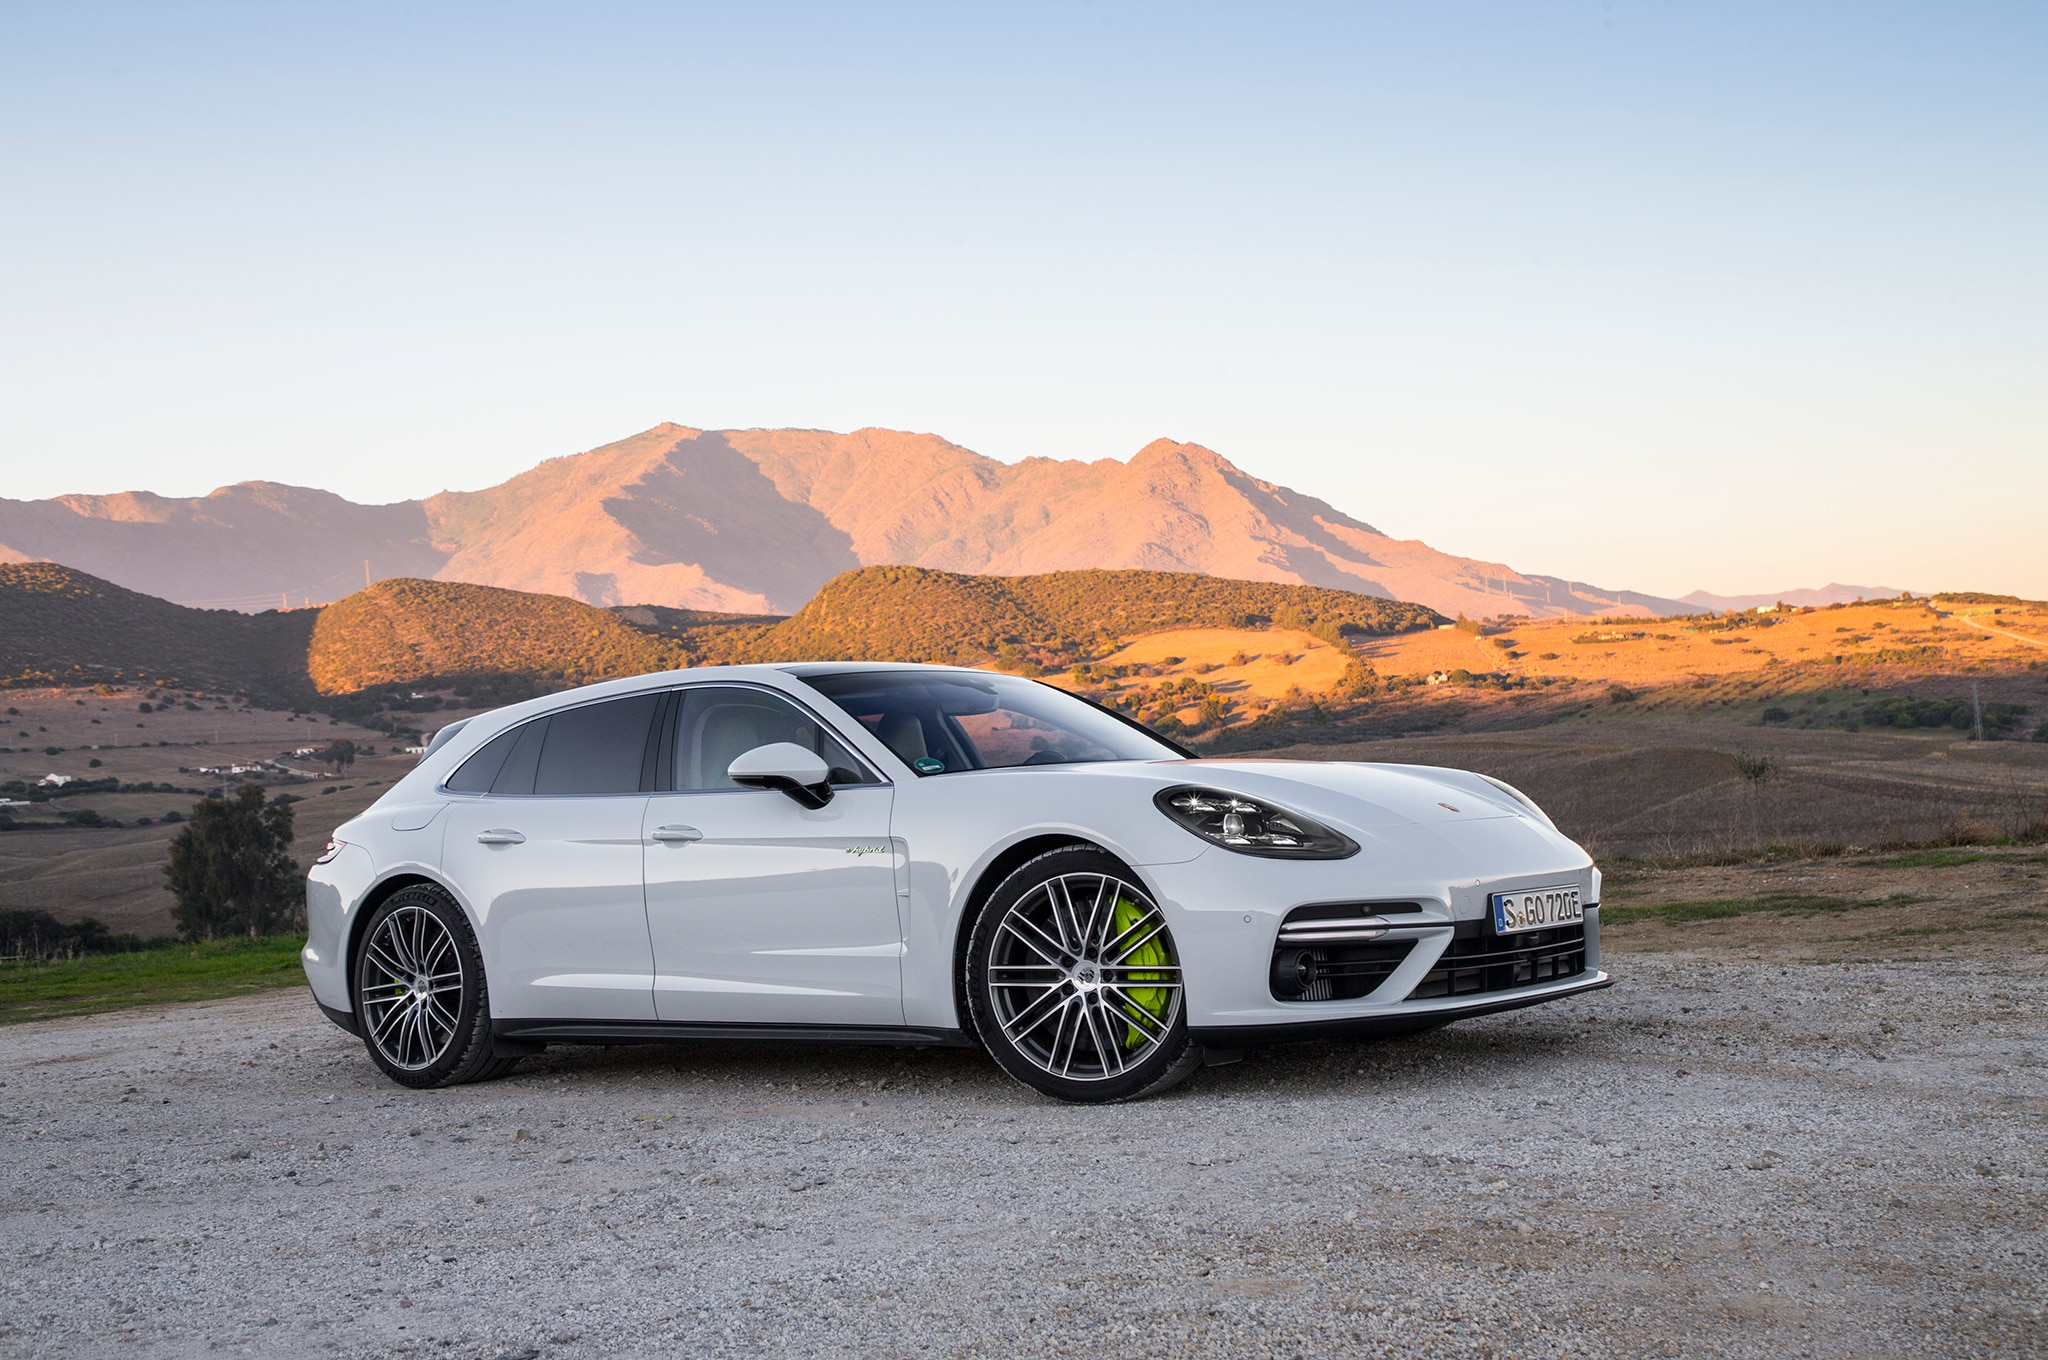 2018 porsche panamera turbo s e hybrid sport turismo first drive review automobile magazine. Black Bedroom Furniture Sets. Home Design Ideas